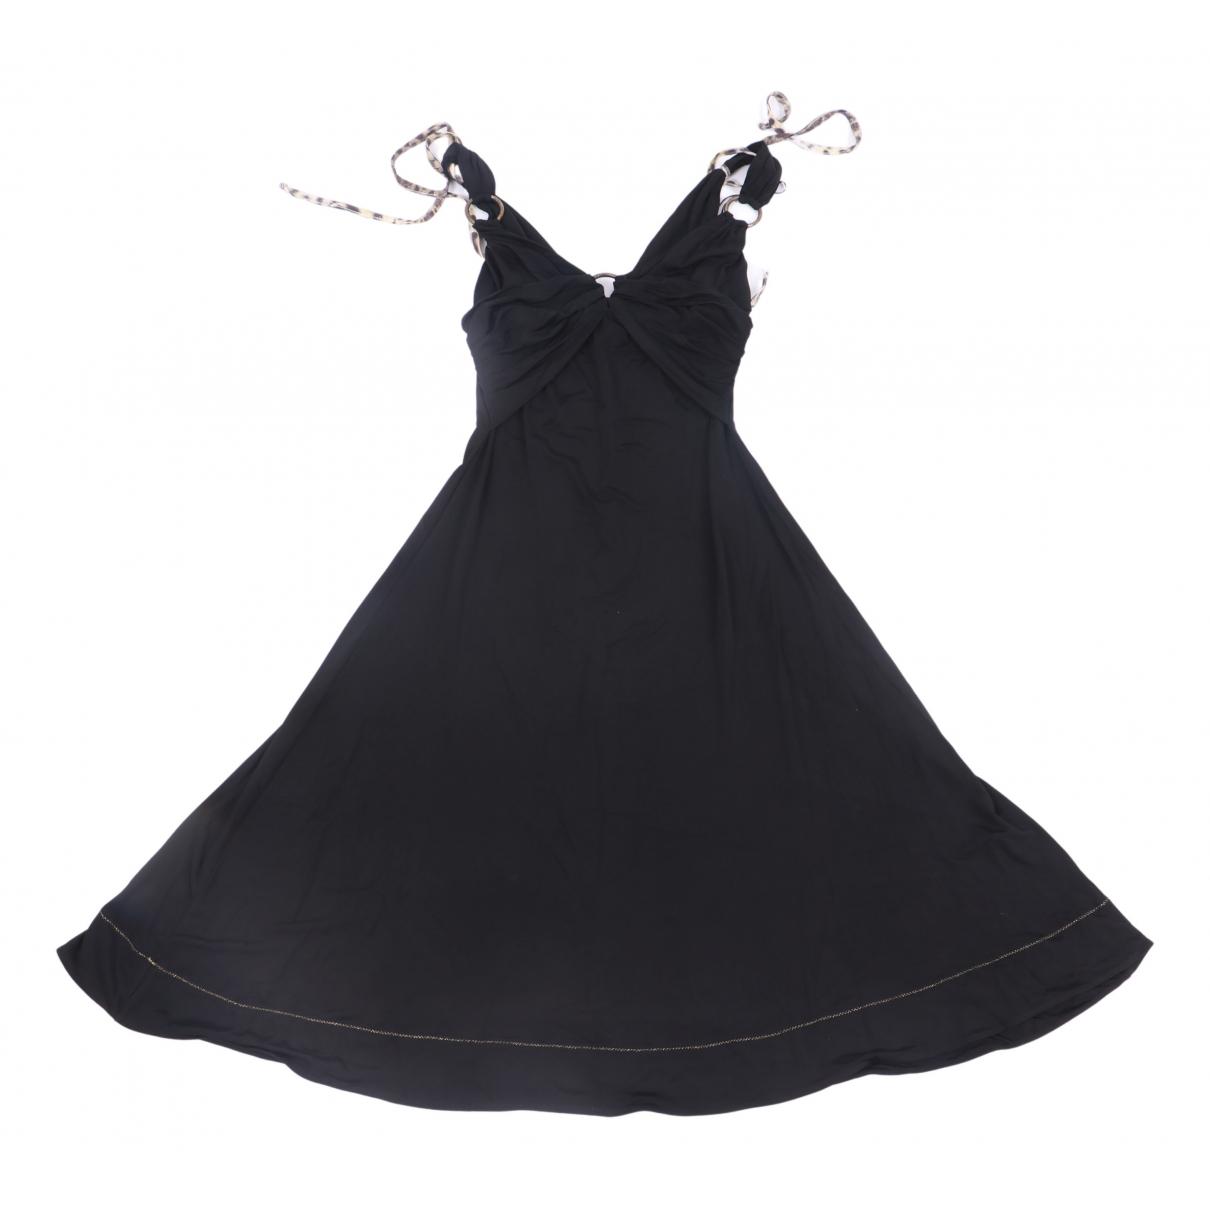 Just Cavalli \N Kleid in  Schwarz Viskose